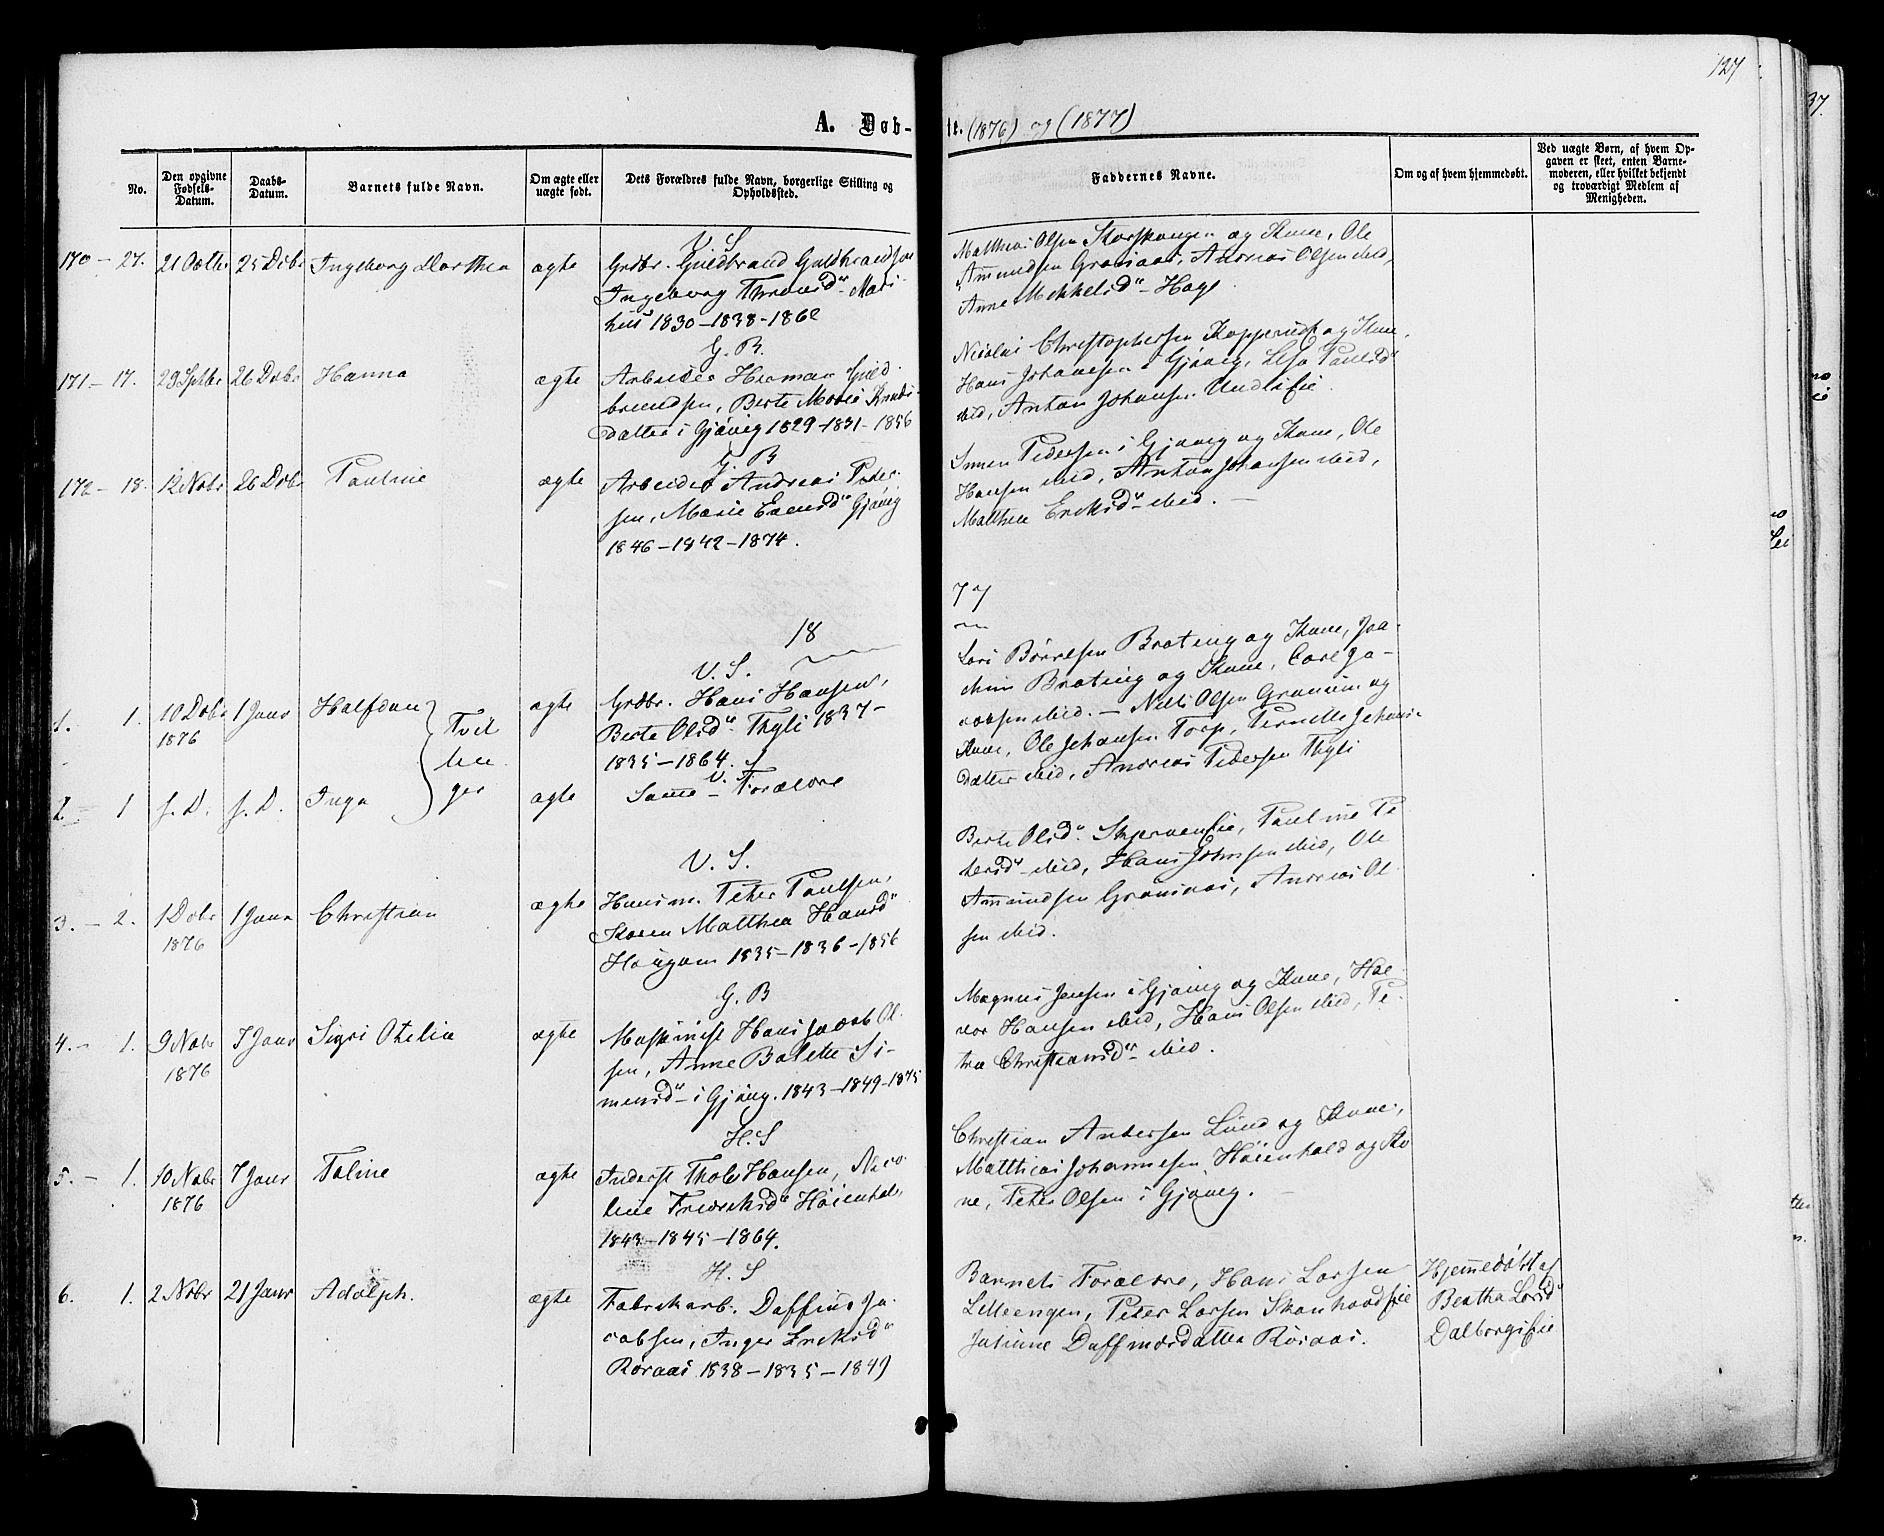 SAH, Vardal prestekontor, H/Ha/Haa/L0007: Ministerialbok nr. 7, 1867-1878, s. 127